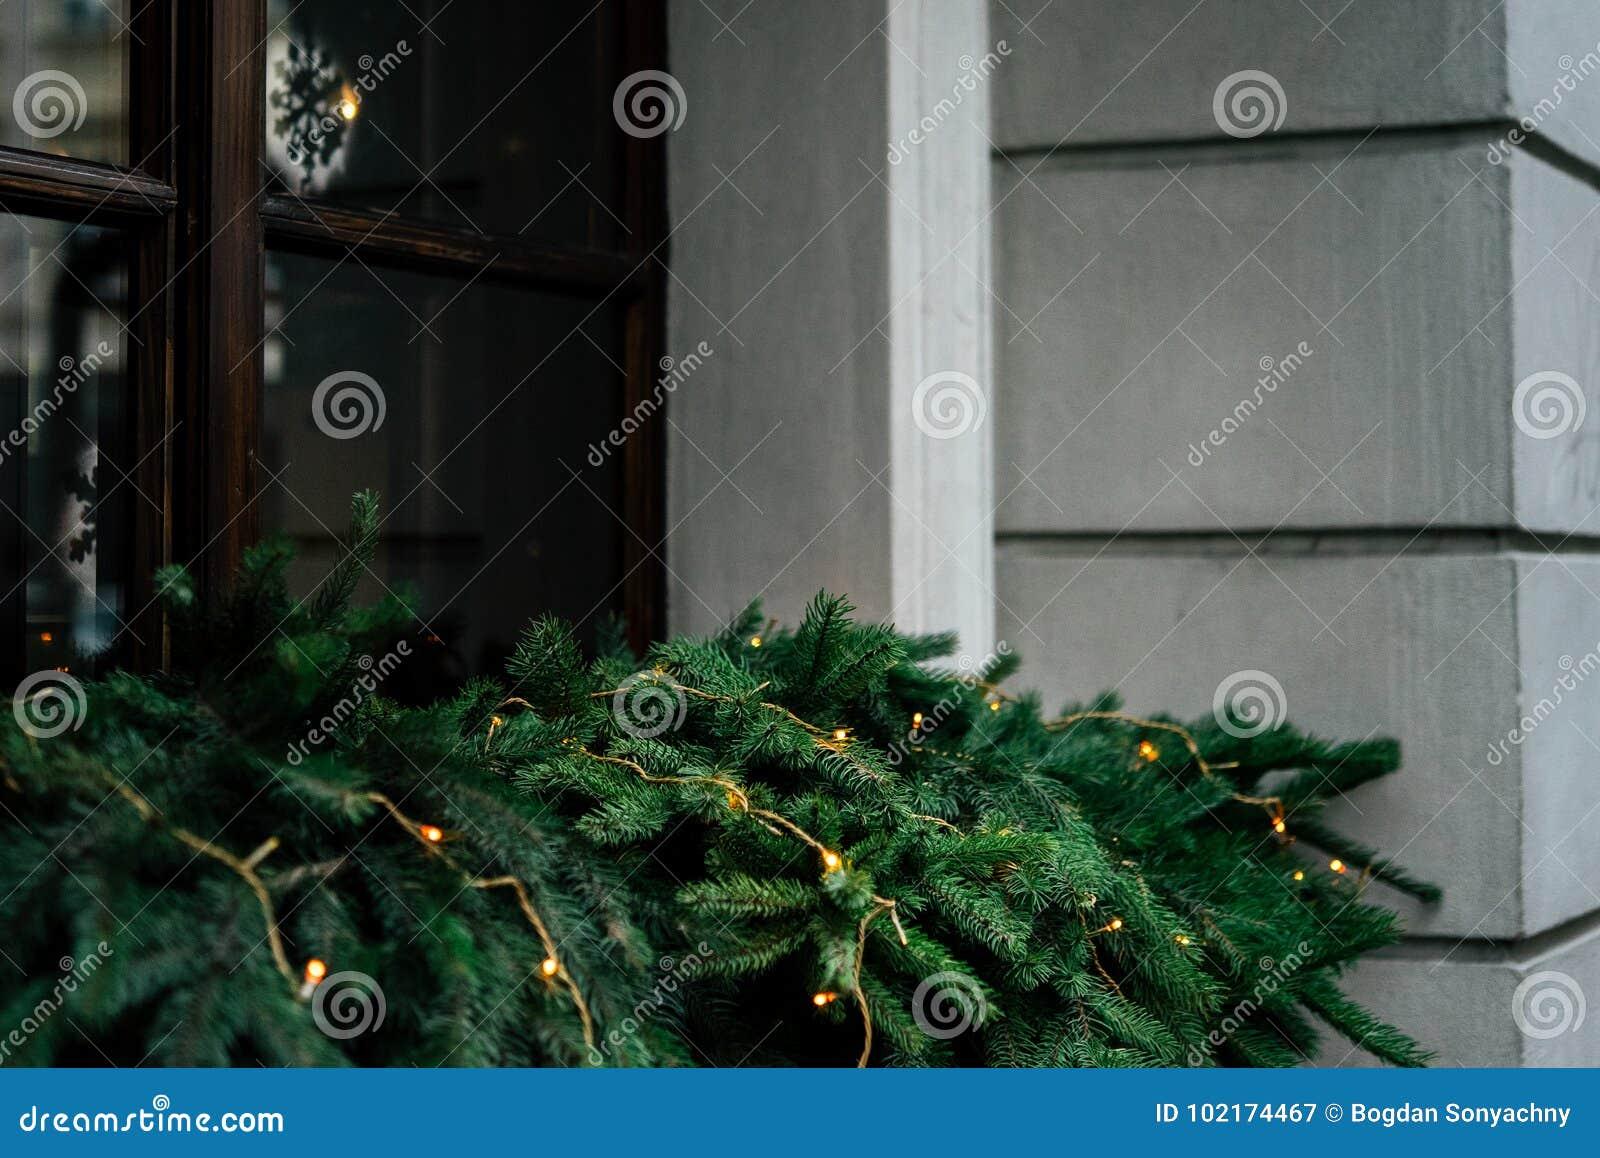 Stylish luxury christmas garland lights on window and green pin download stylish luxury christmas garland lights on window and green pin stock image image of aloadofball Image collections